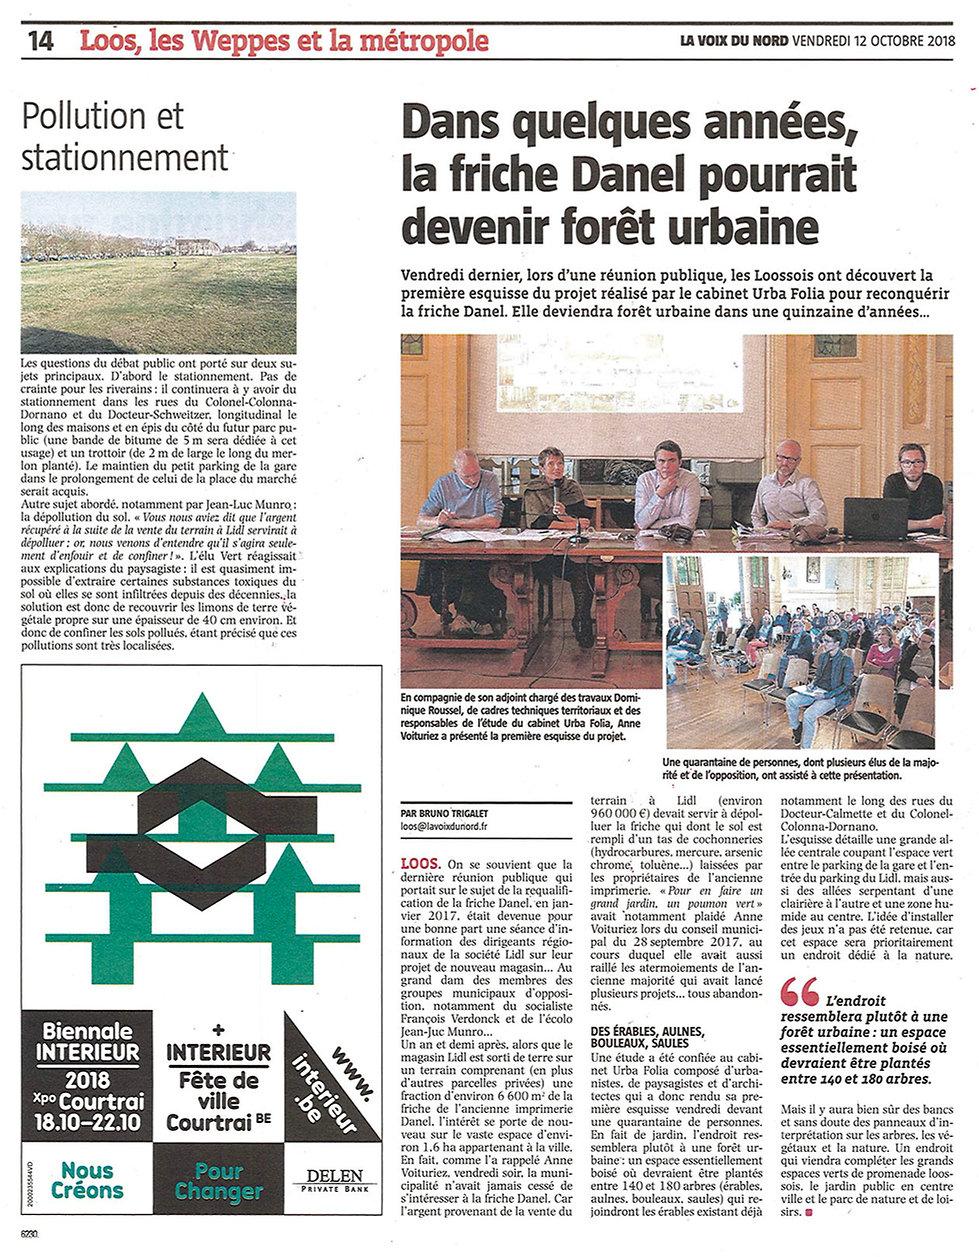 LOOS - Friche Danel - VDN 12.10.2018.jpg